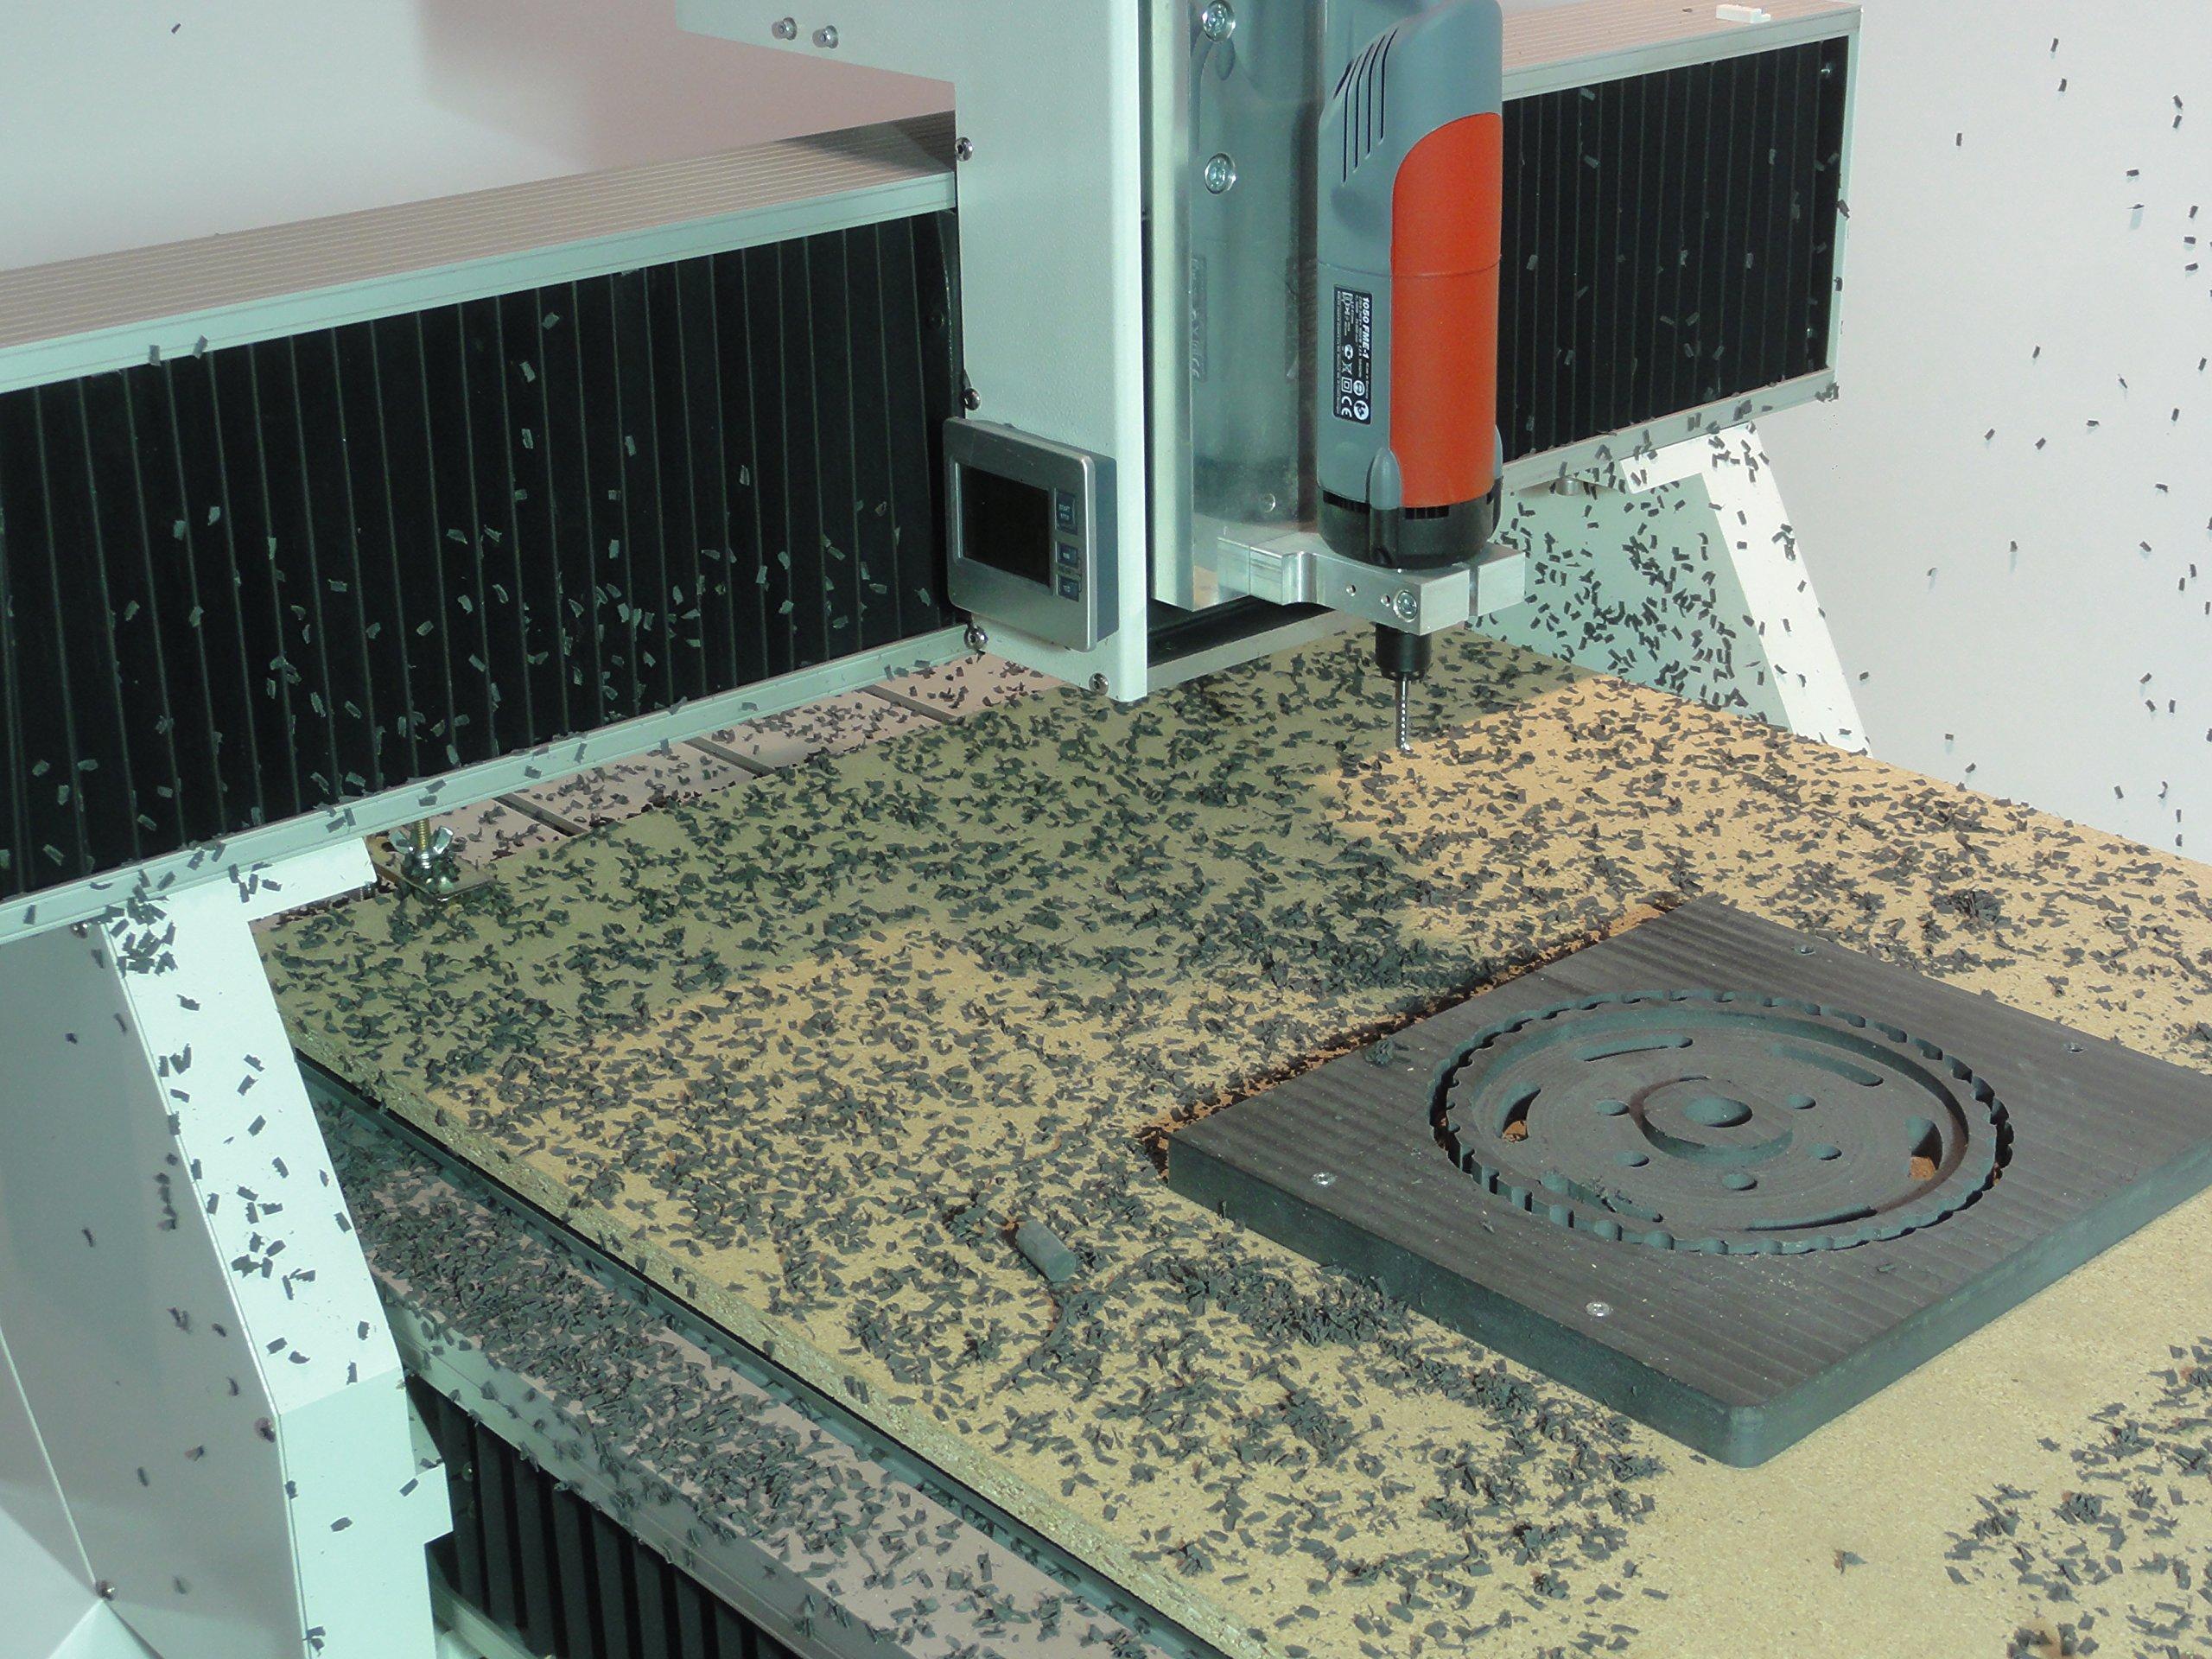 Portalfräsmaschine T-Rex aus Stahl - 900x600mm - CNC-STEP